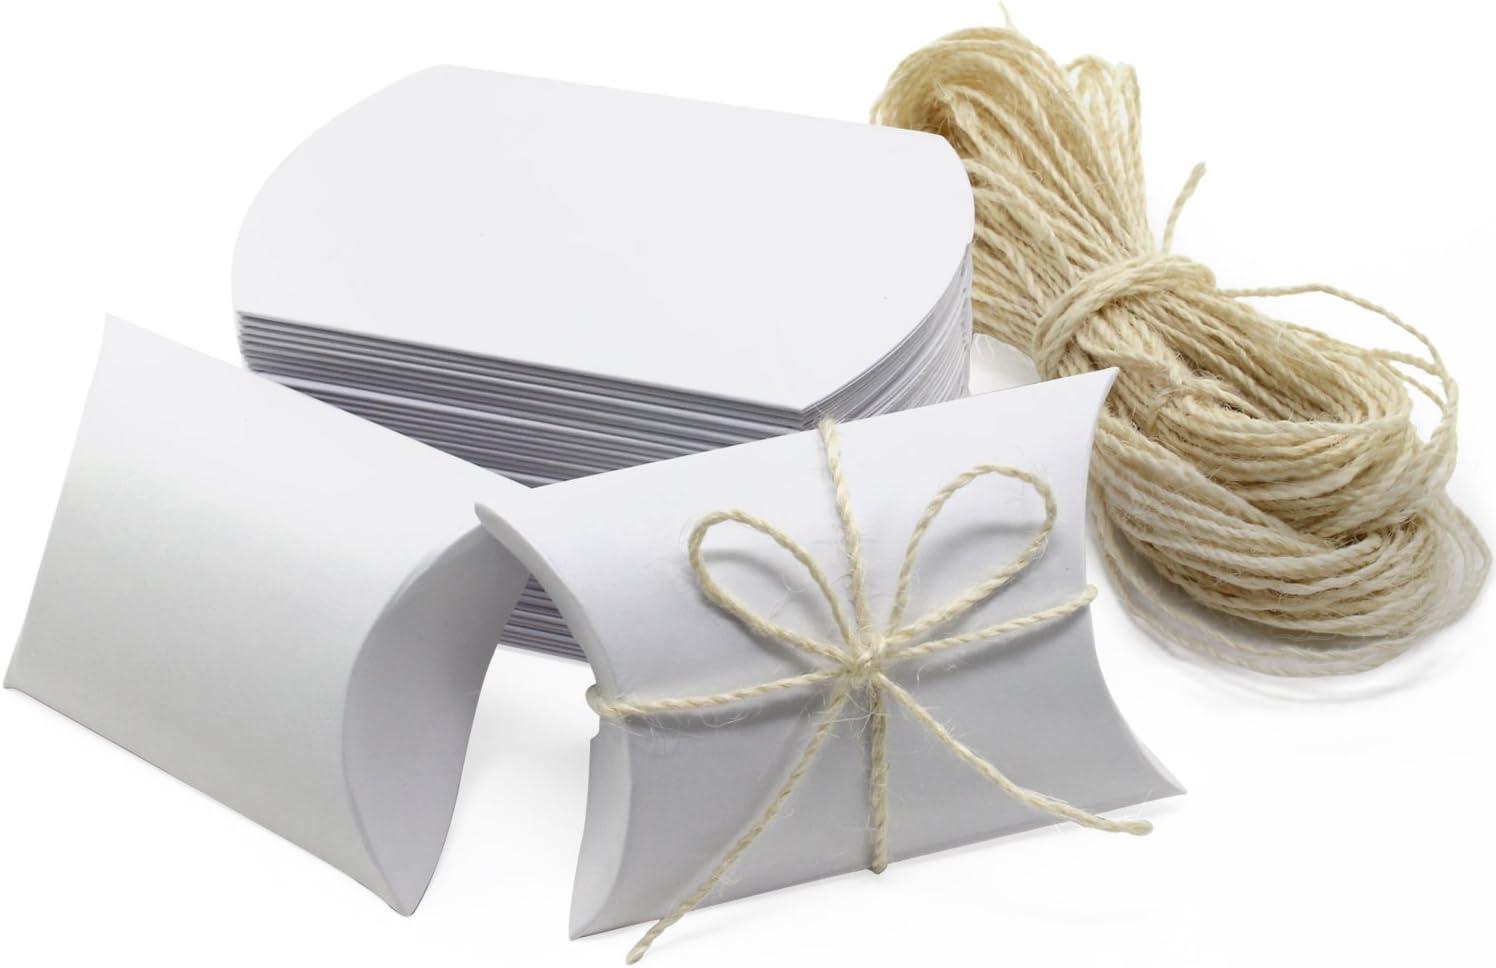 HSeaMall Caja de almohada Caja de regalo de caja de dulces de papel Kraft para boda, fiesta de cumpleaños, blanco, 50PCS